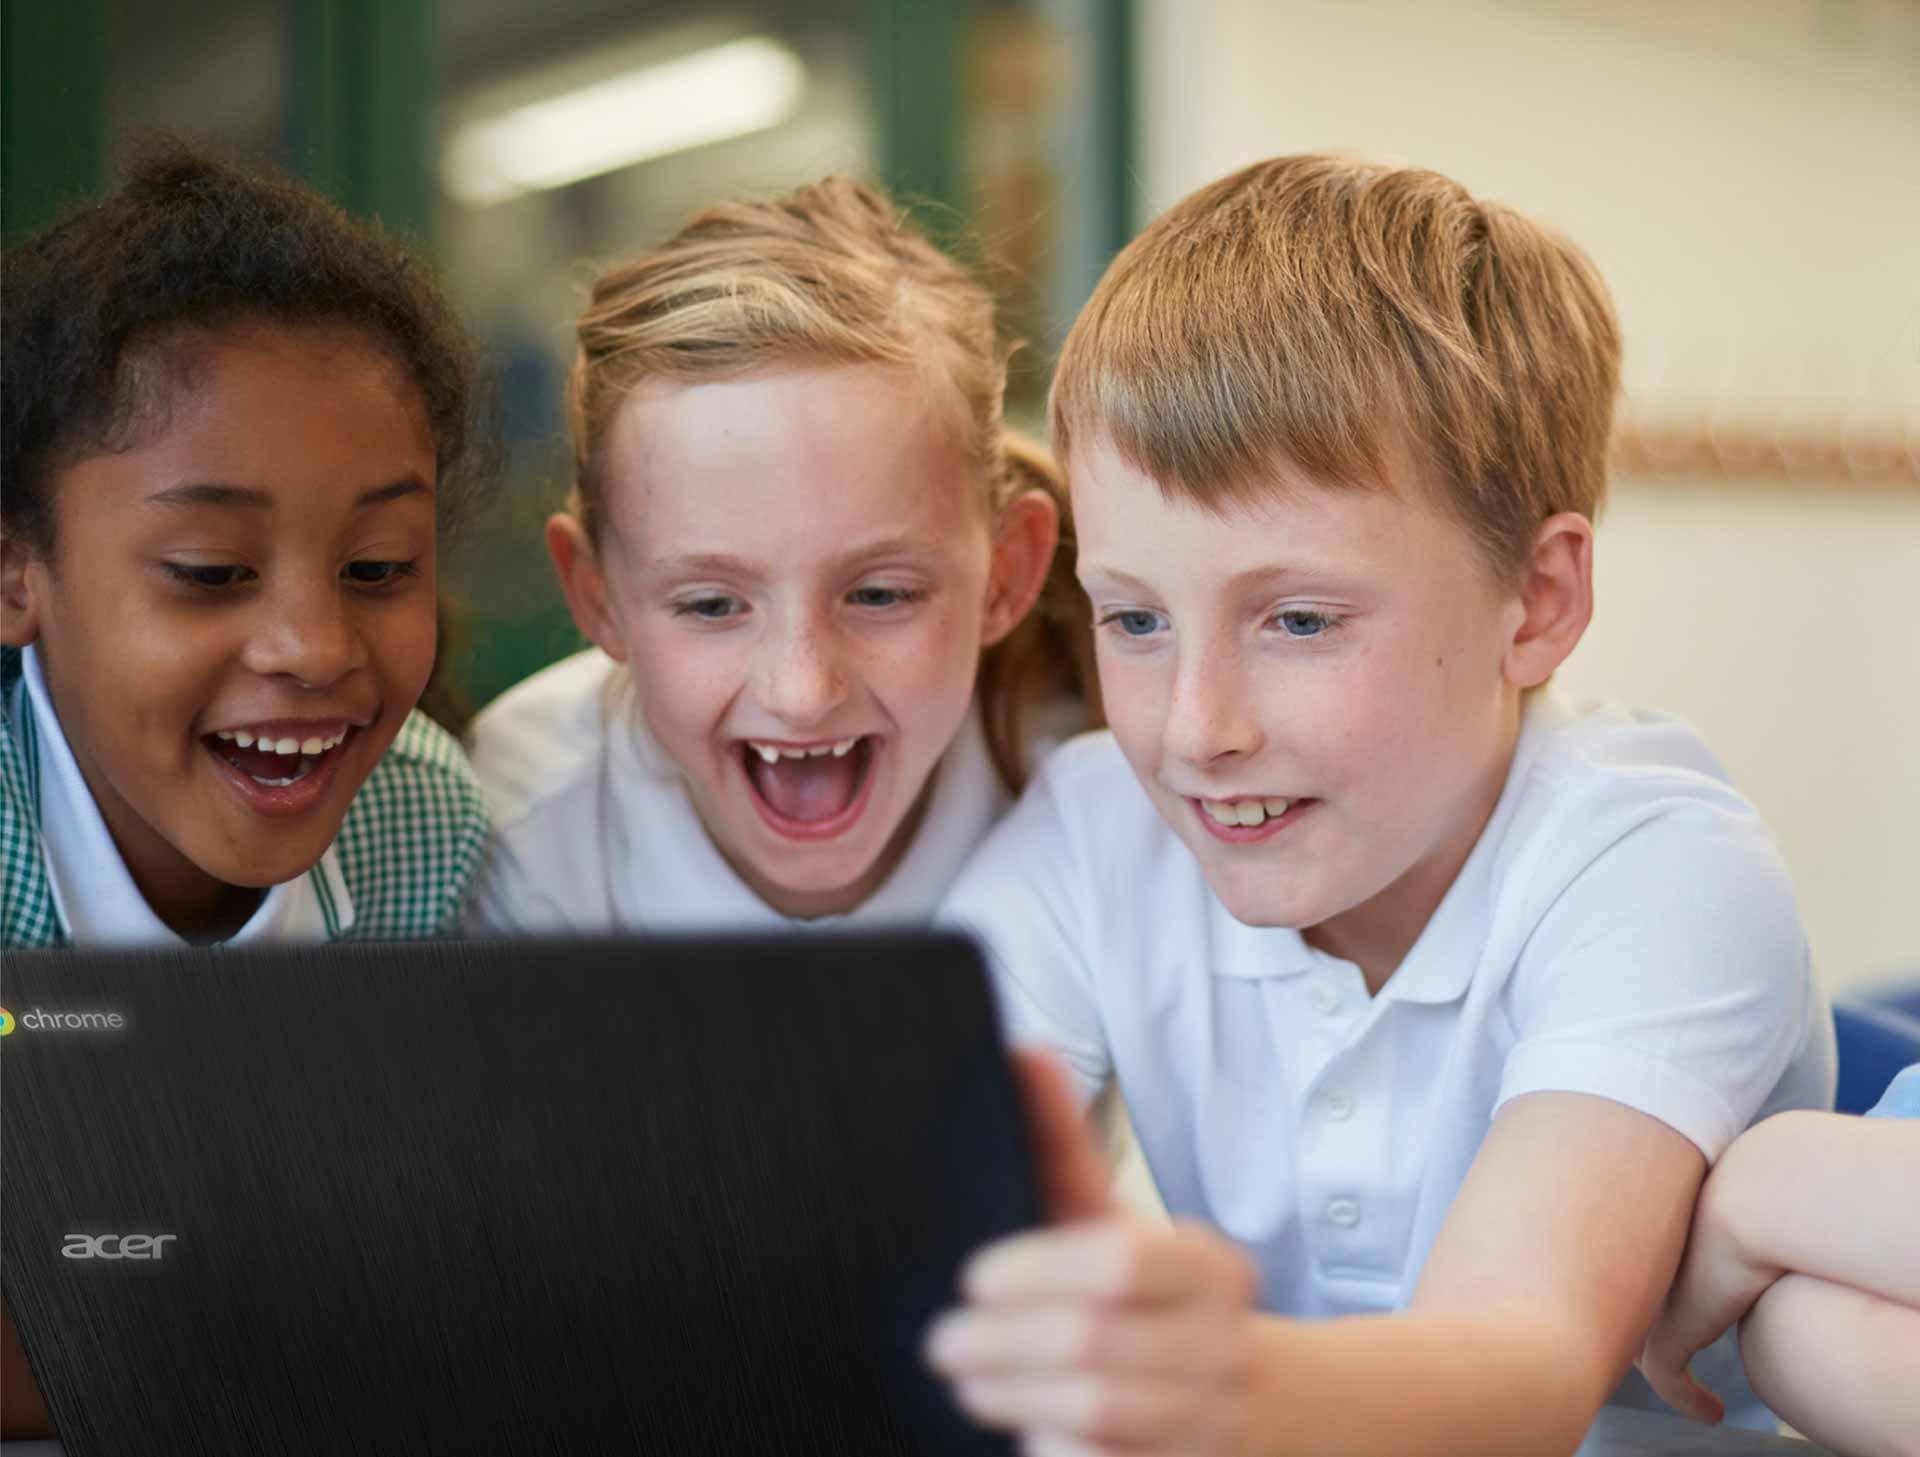 edu-Chromebook im Klassenzimmer